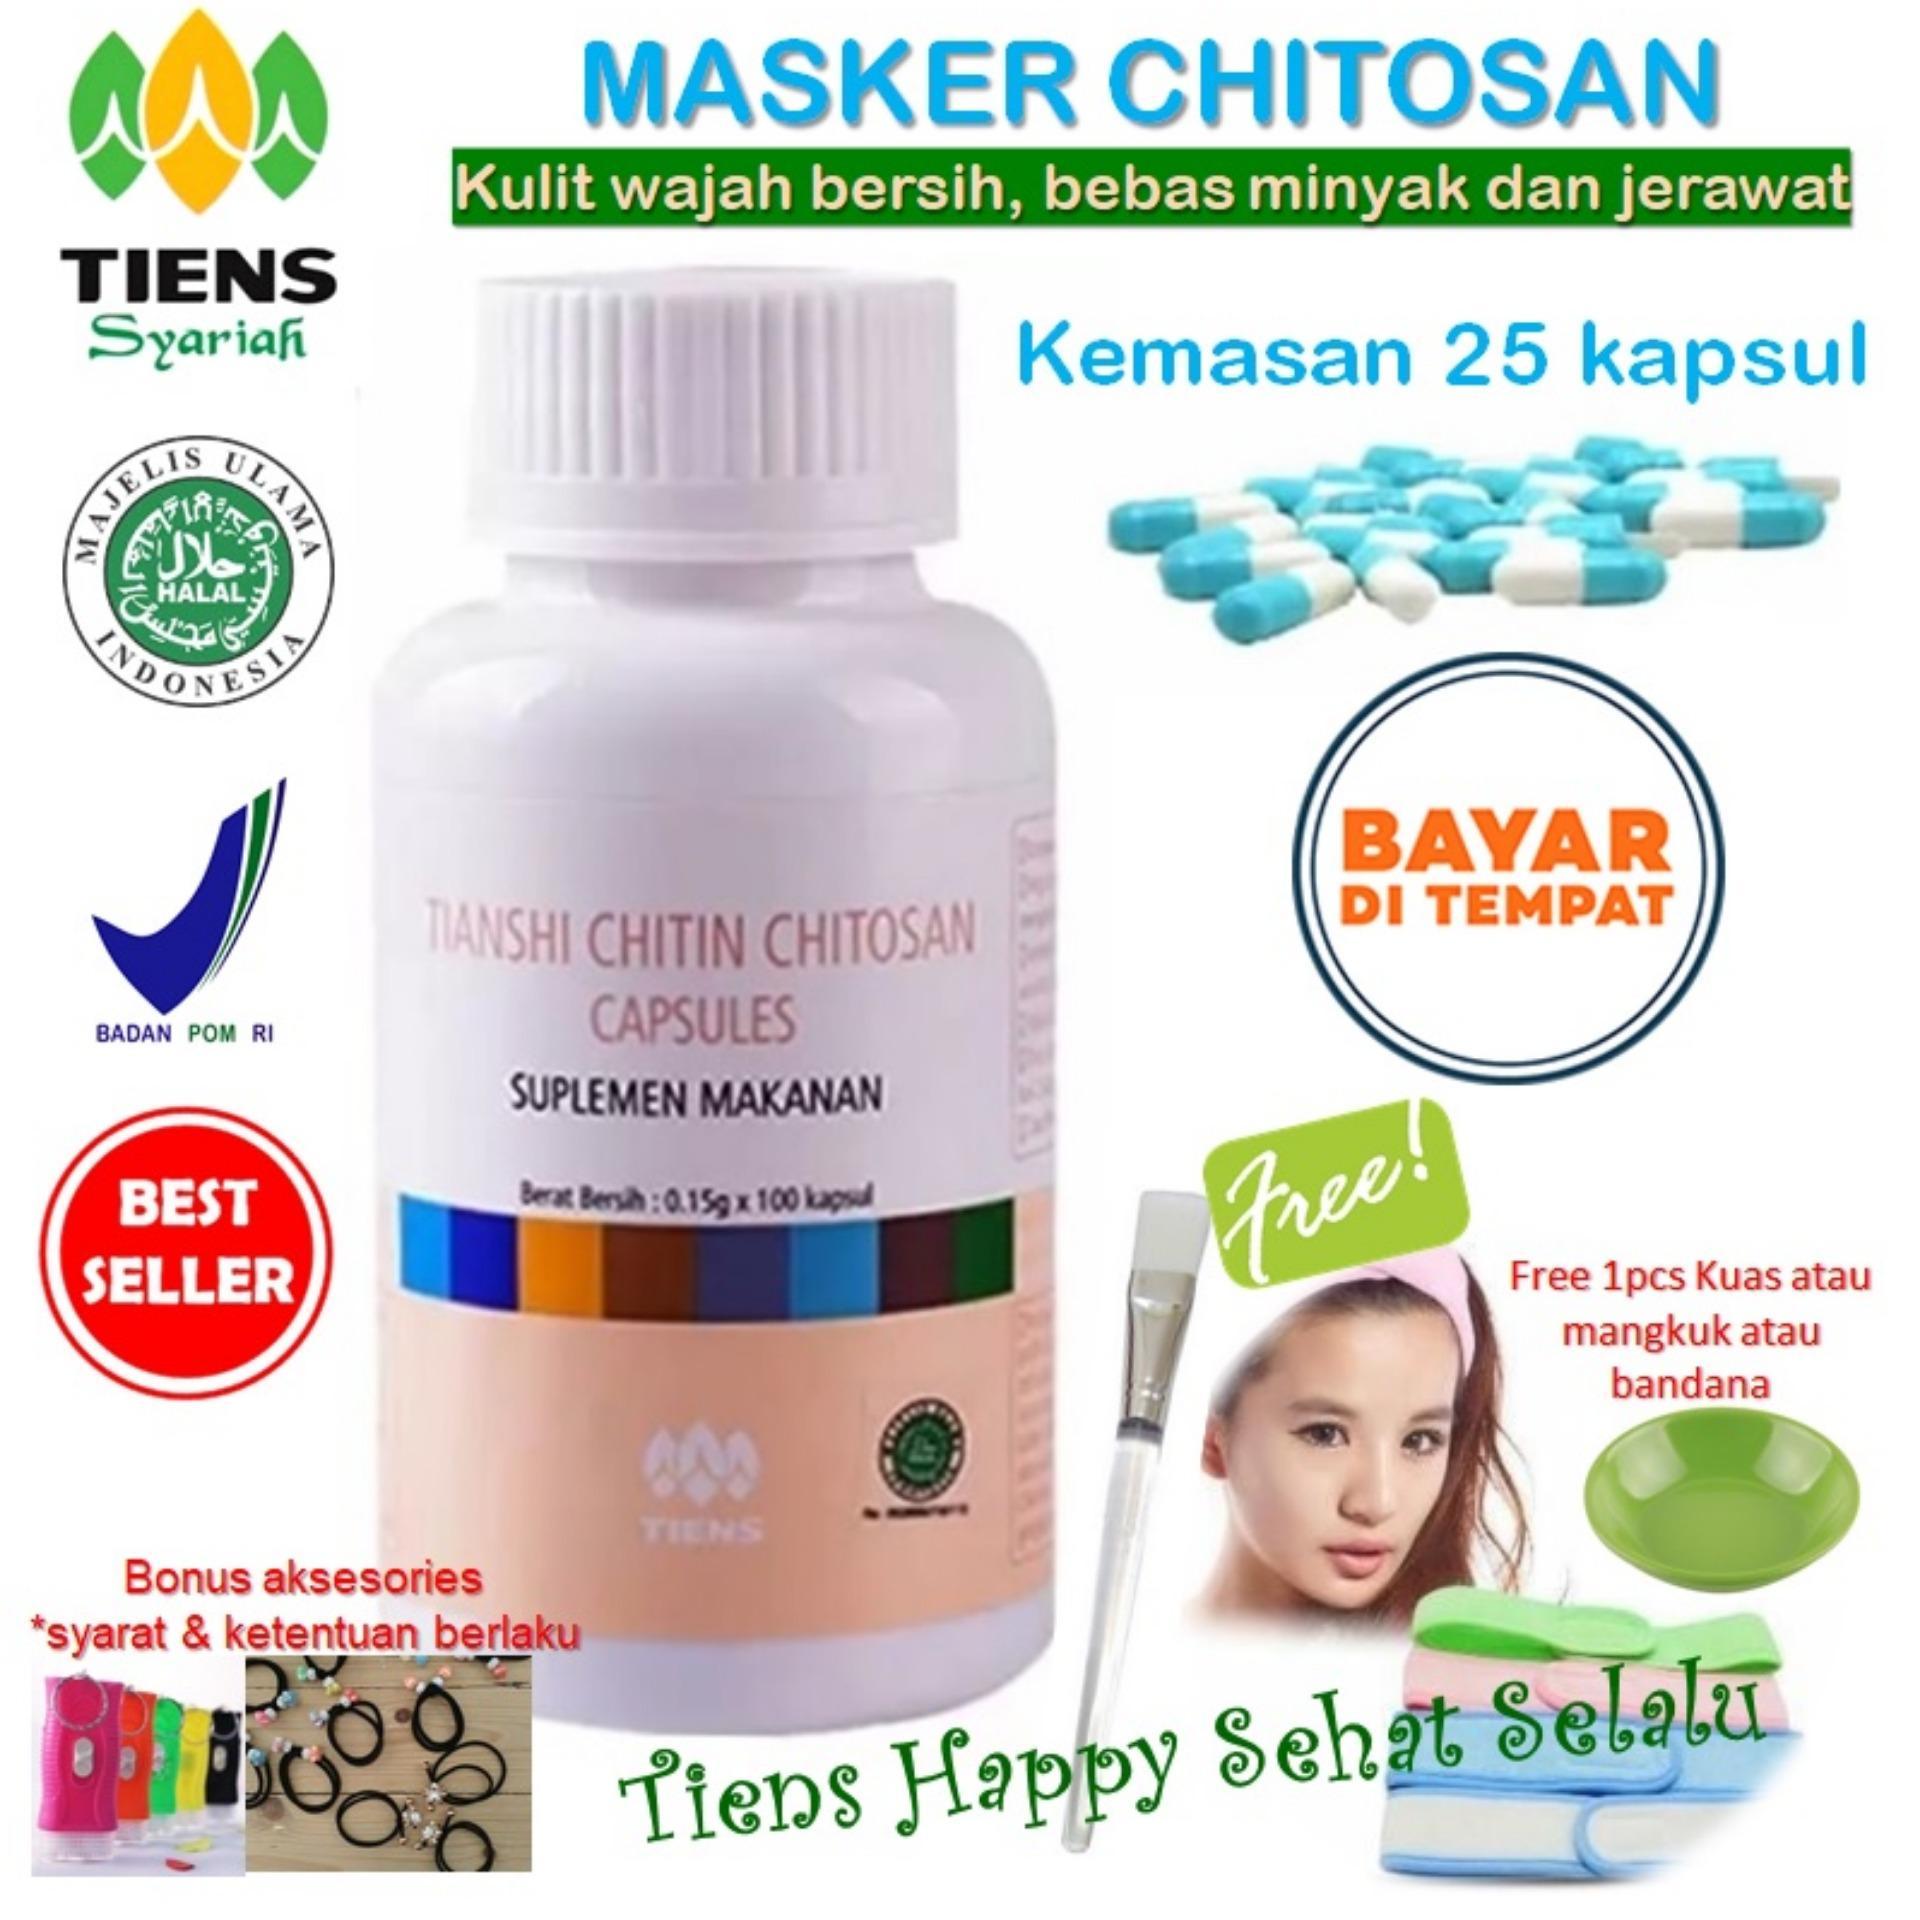 Tips Beli Masker Tiens Chitosan Herbal Anti Jerawat Isi 25 Kapsul Promo